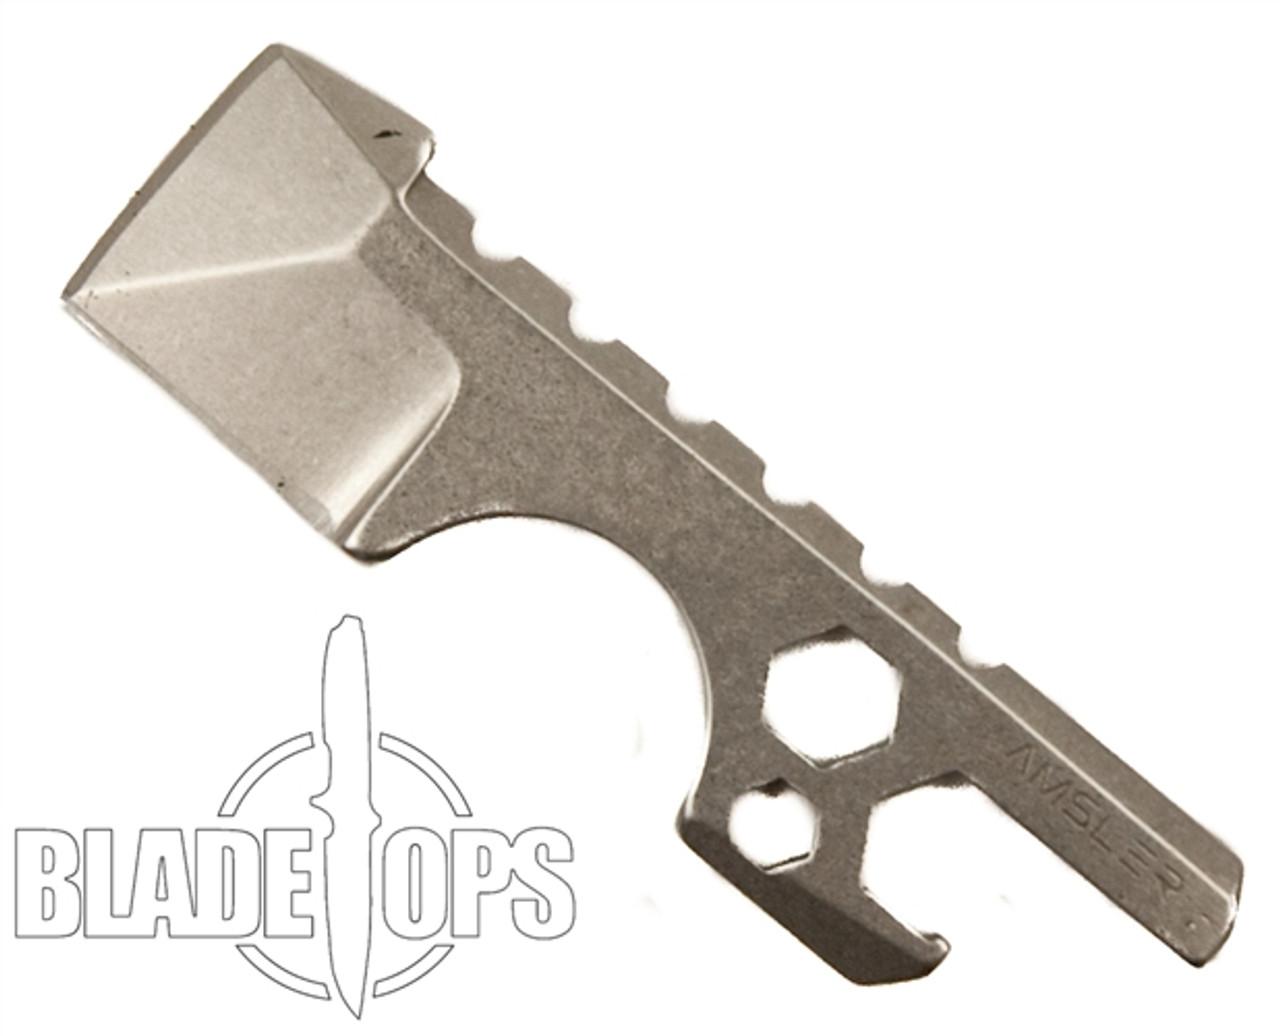 Amsler Knives Bottle Defense Tool, Hand Ground S35VN, Kydex Sheath